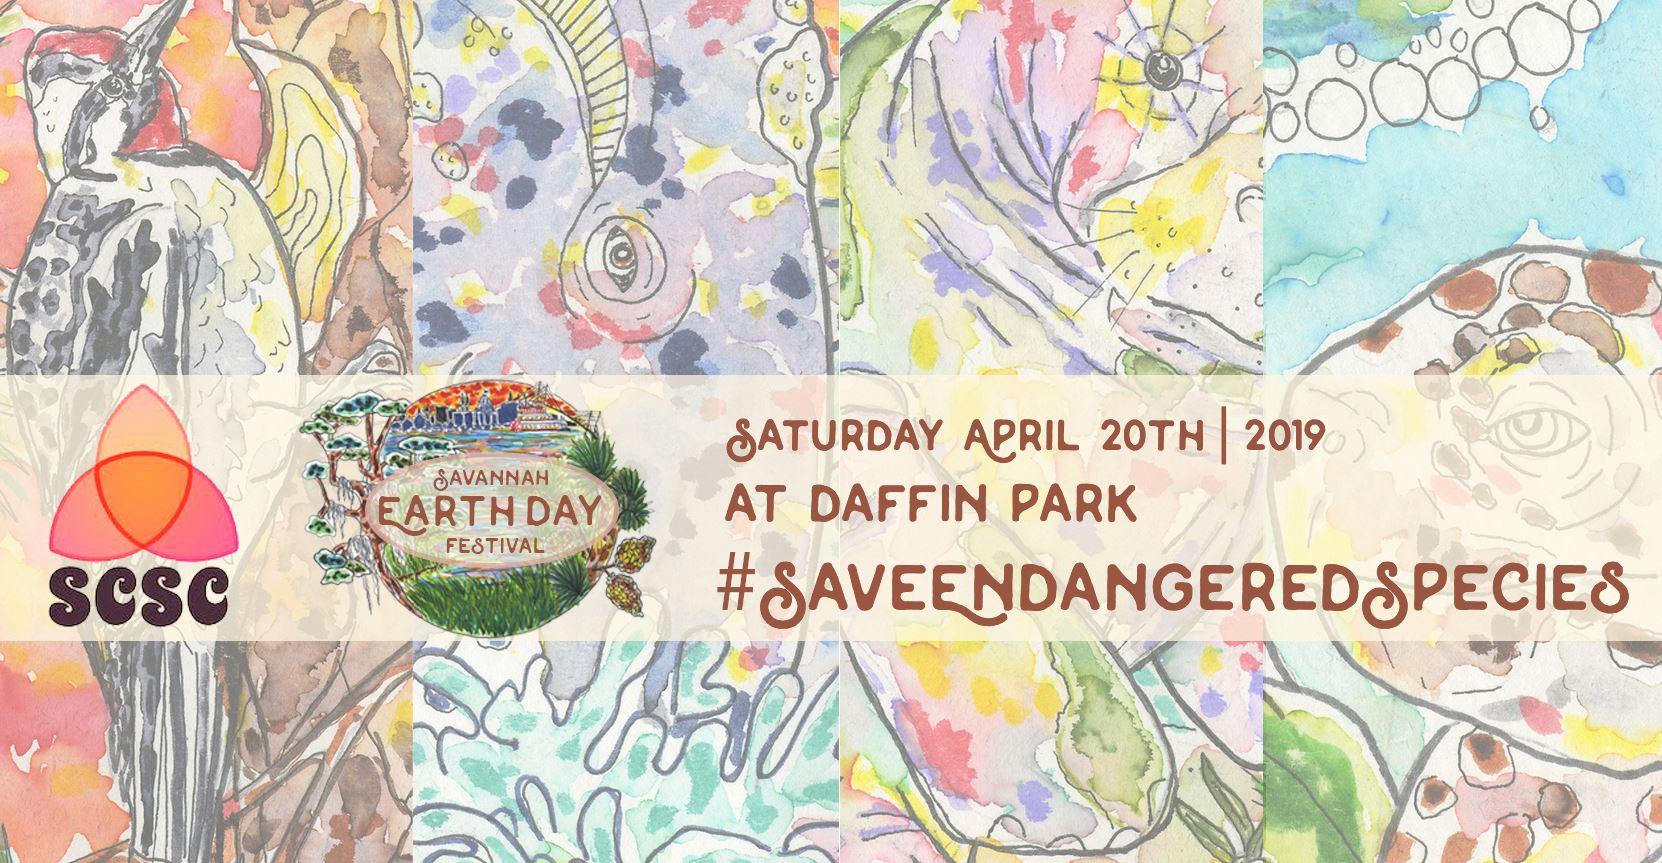 Savannah Spring Festivals 2019 Earth Day Daffin Park